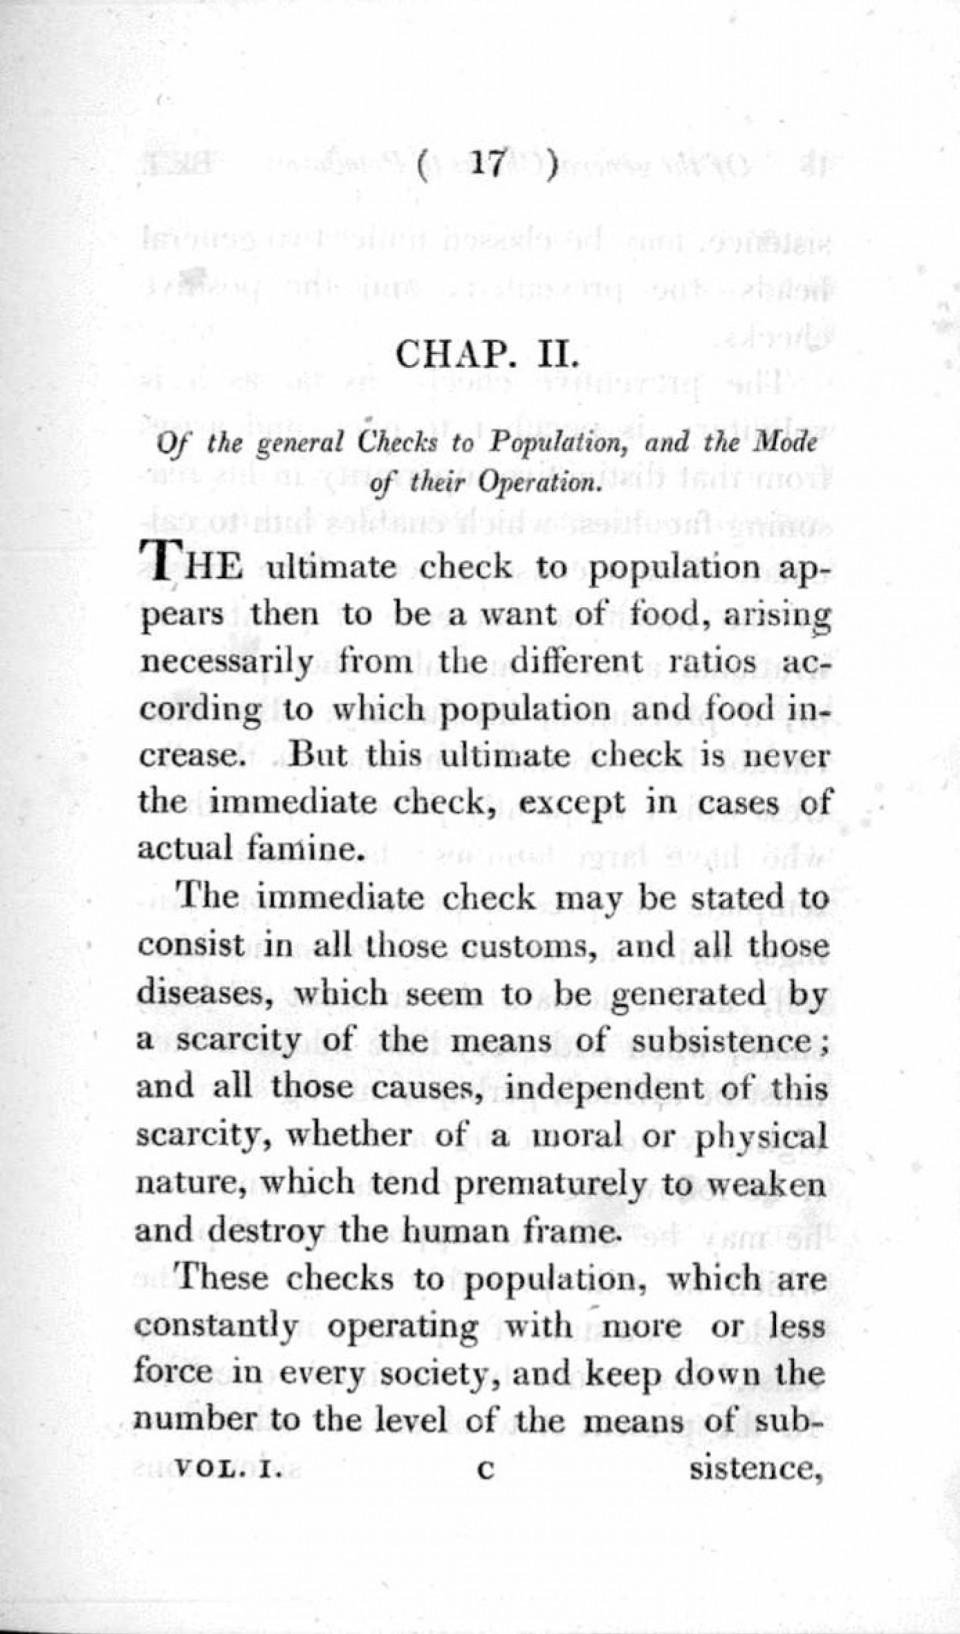 012 Essay Example On The Principle Of Singular Population Malthus Sparknotes Thomas Main Idea 960